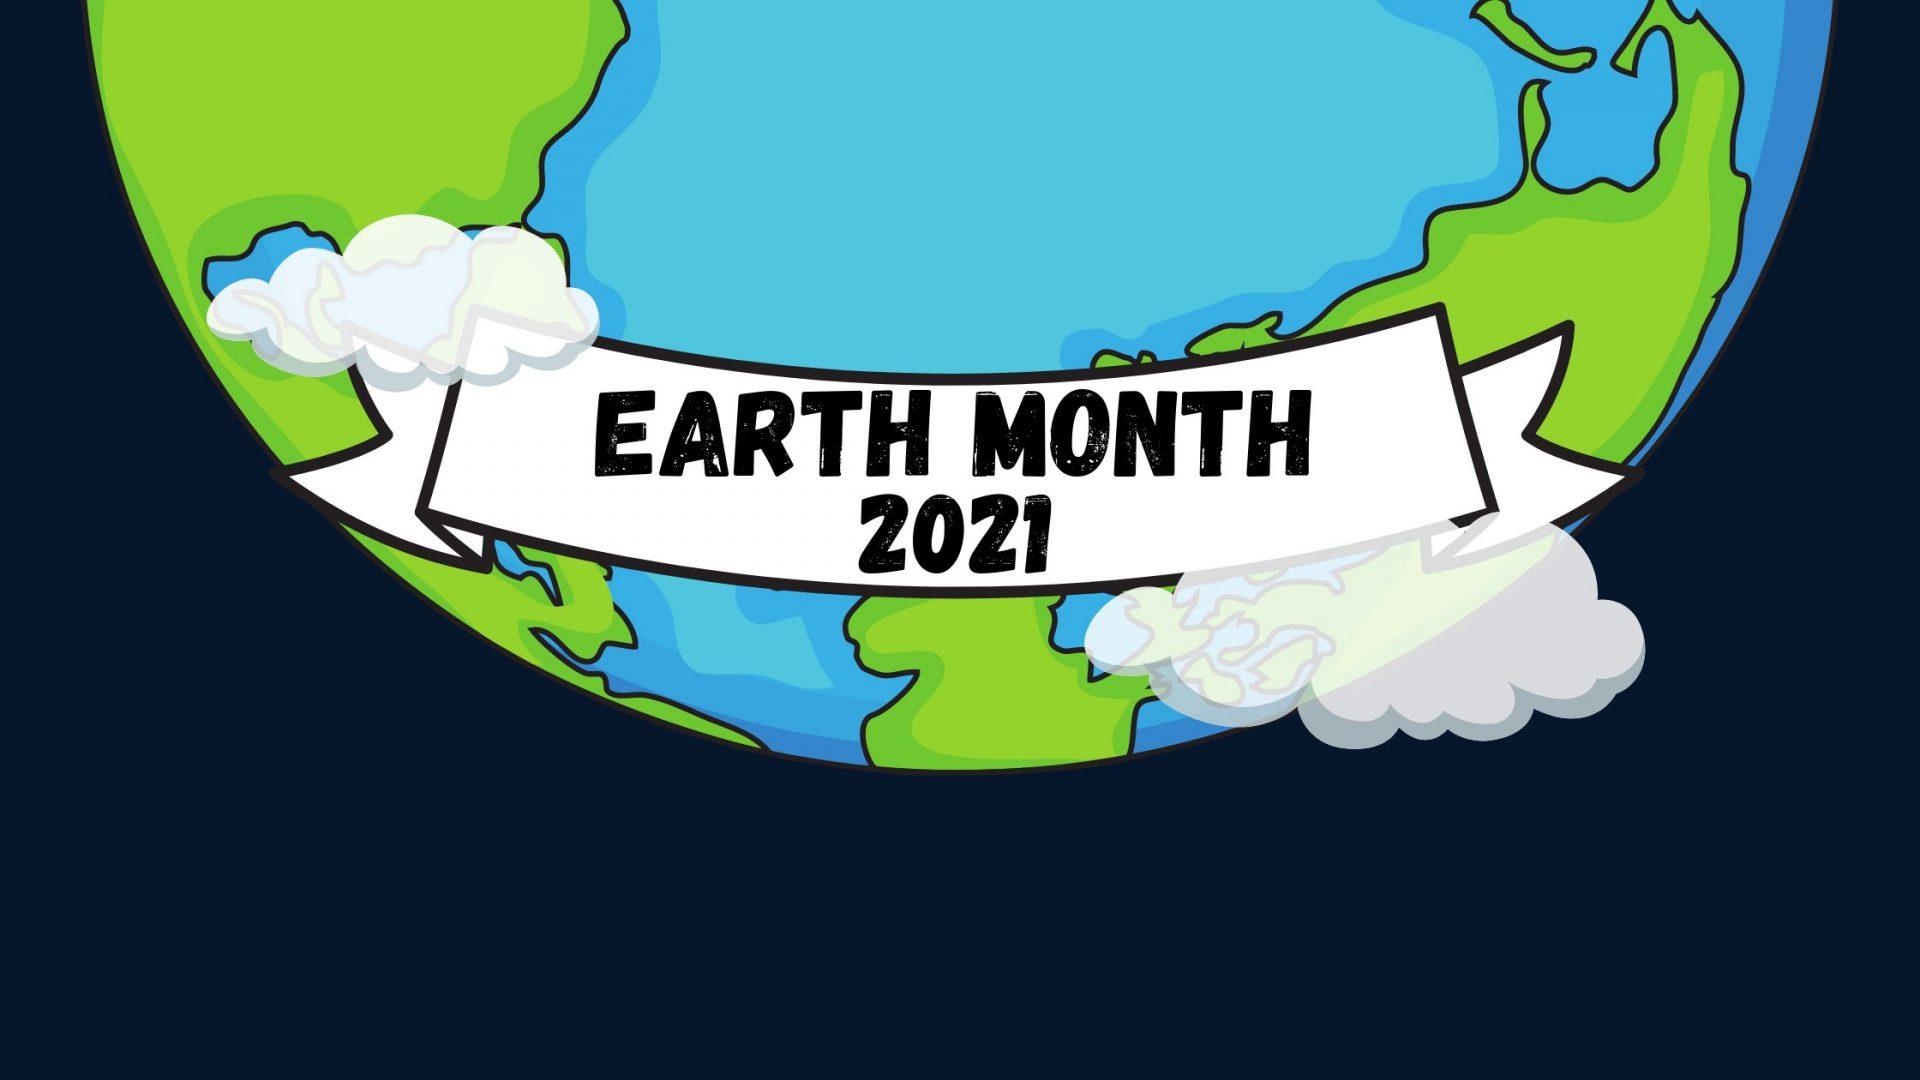 Earth Month 2021 – RethinkWaste